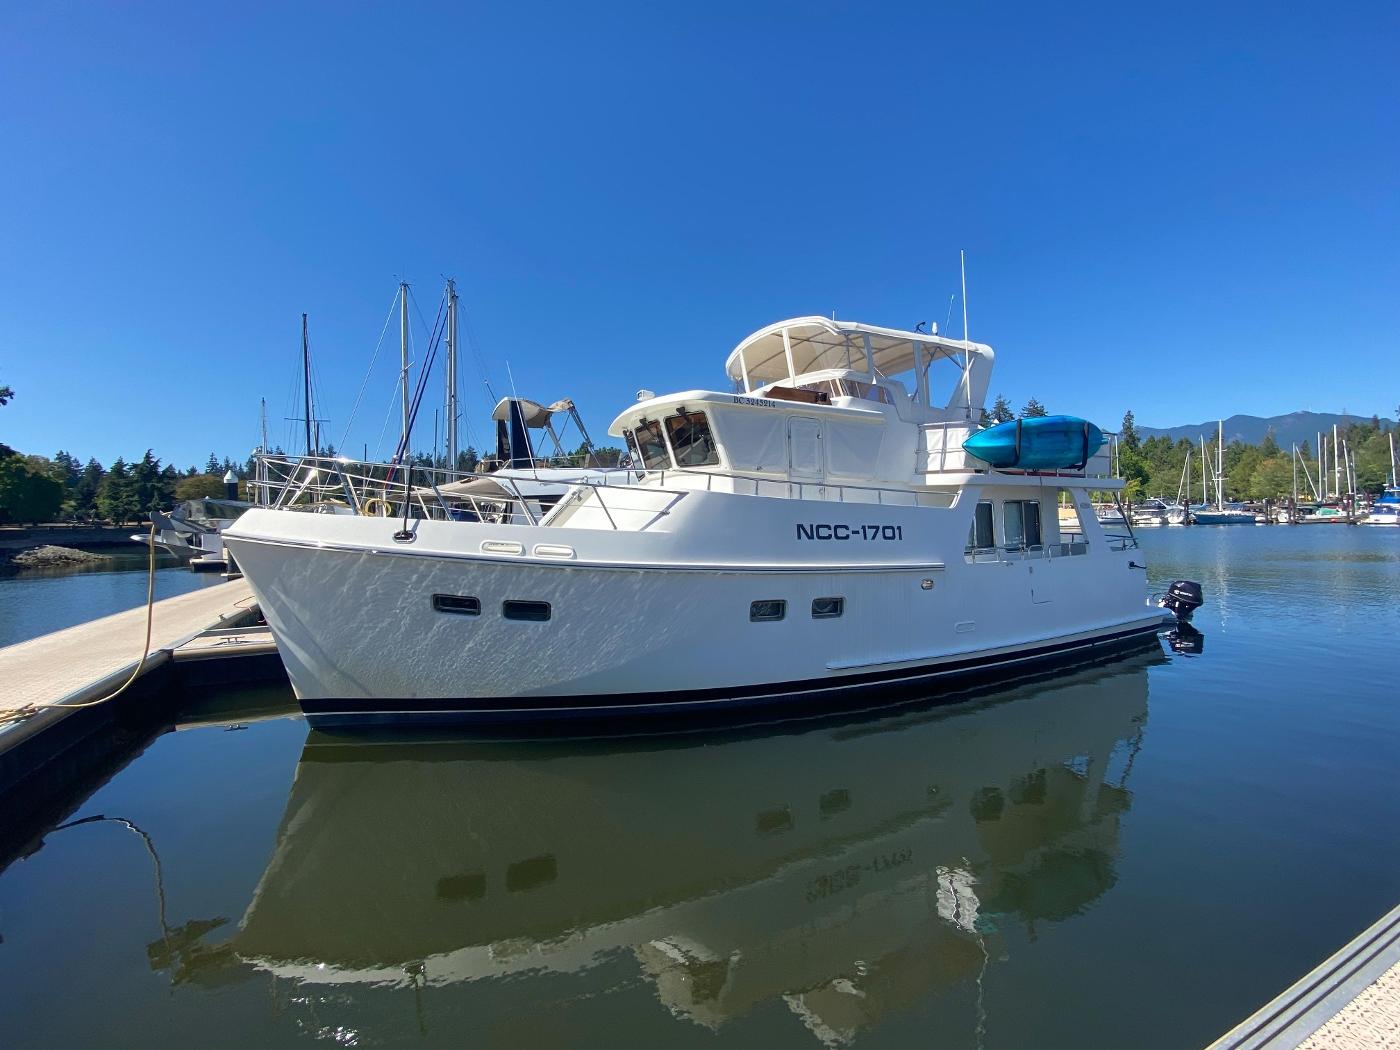 2011 Selene 45, NCC-1701 at the dock